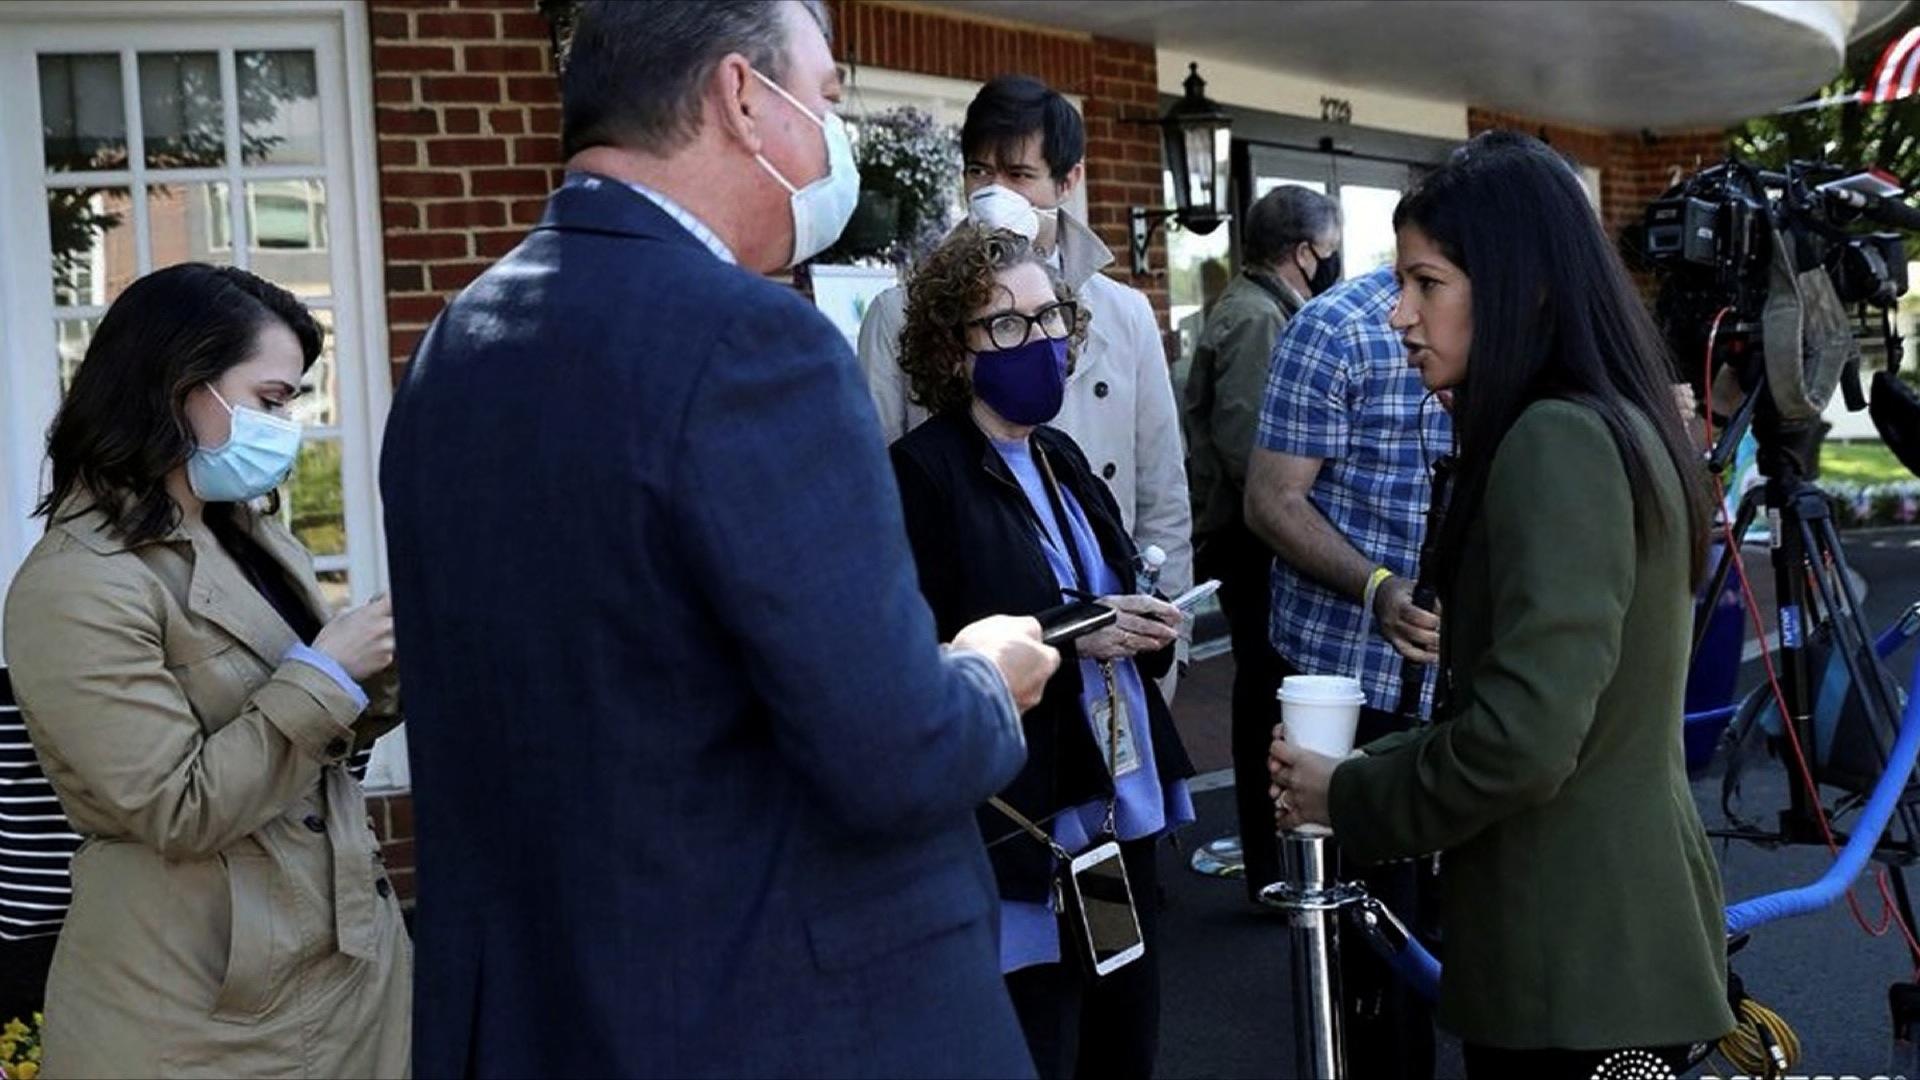 Katie Miller, US Vice President's spokeswoman, tests positive for coronavirus